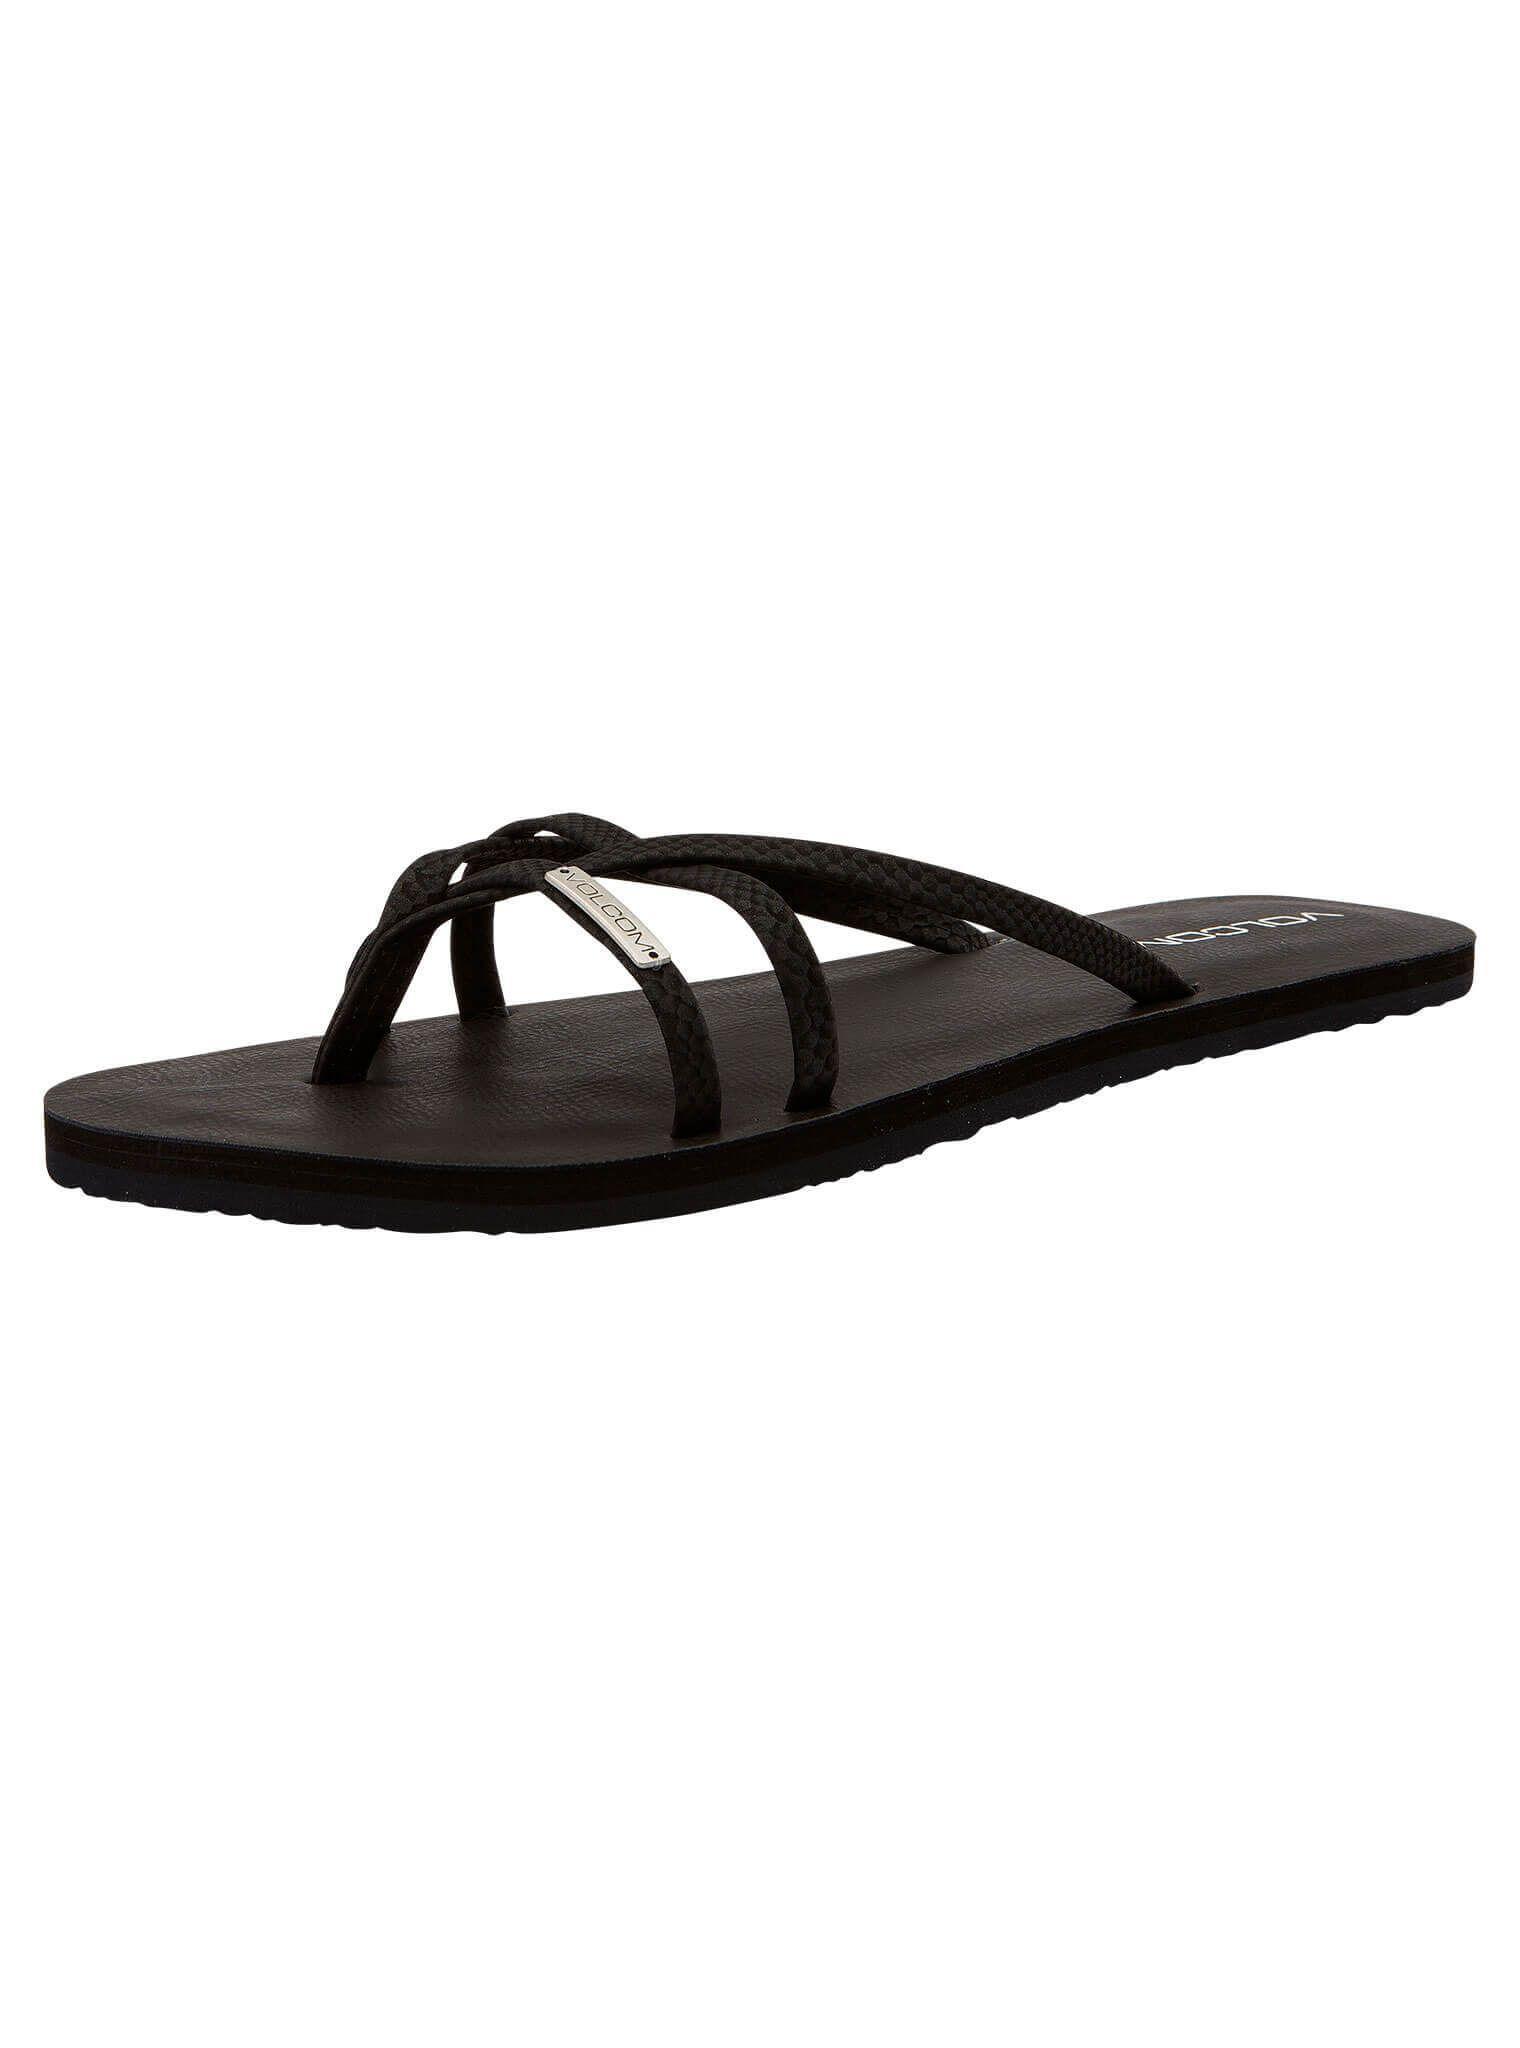 7d4d11f58ac316 Lyst - Volcom Lookout 2 Sandals - Black Combo - 10 in Black